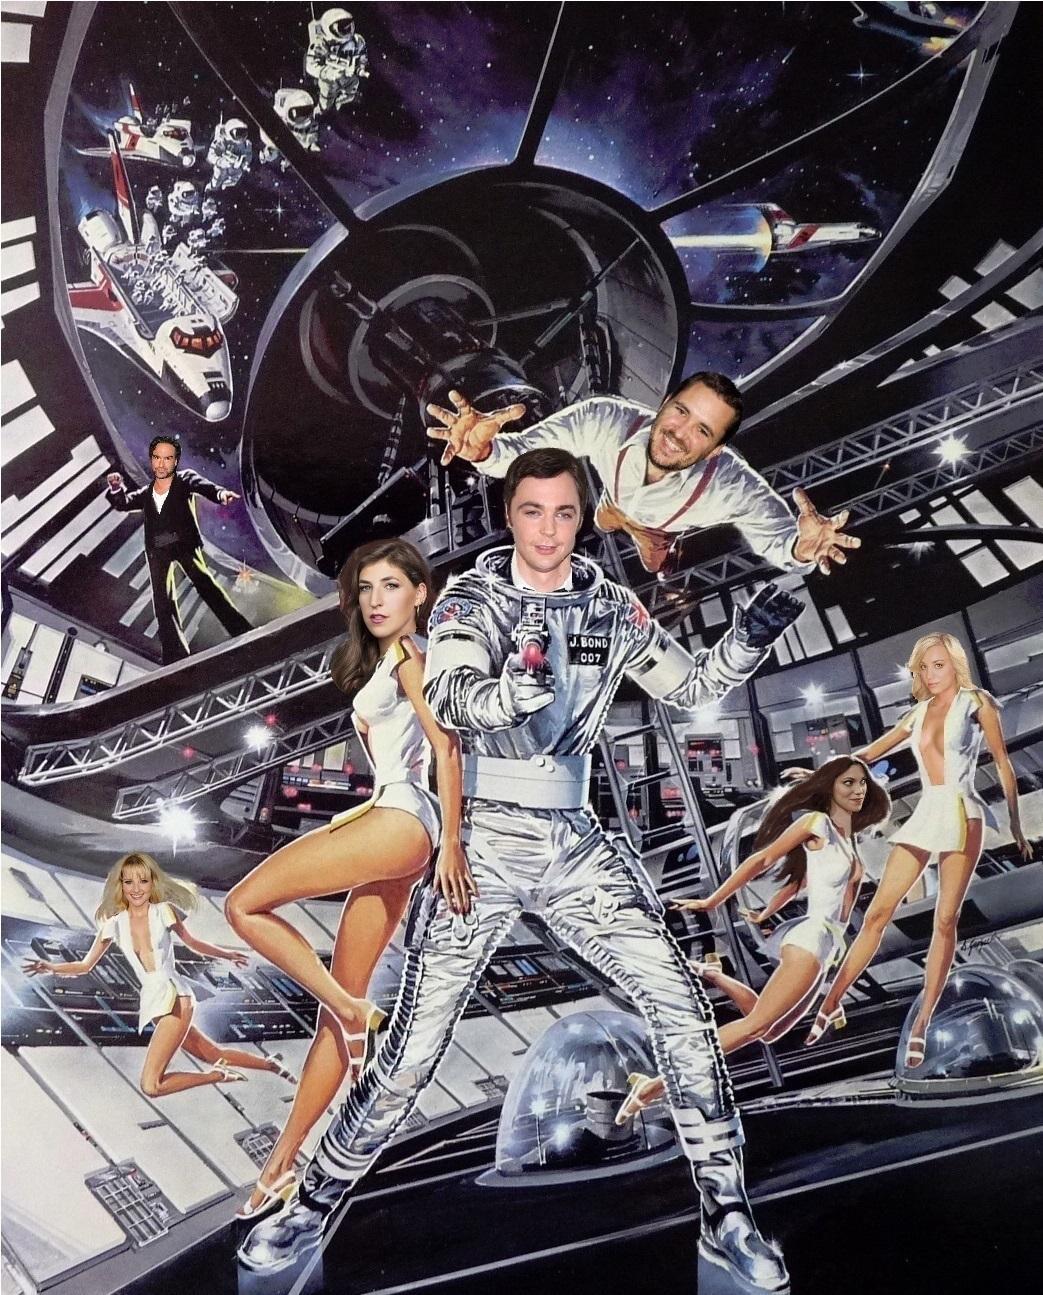 The Big Bond Theory #13